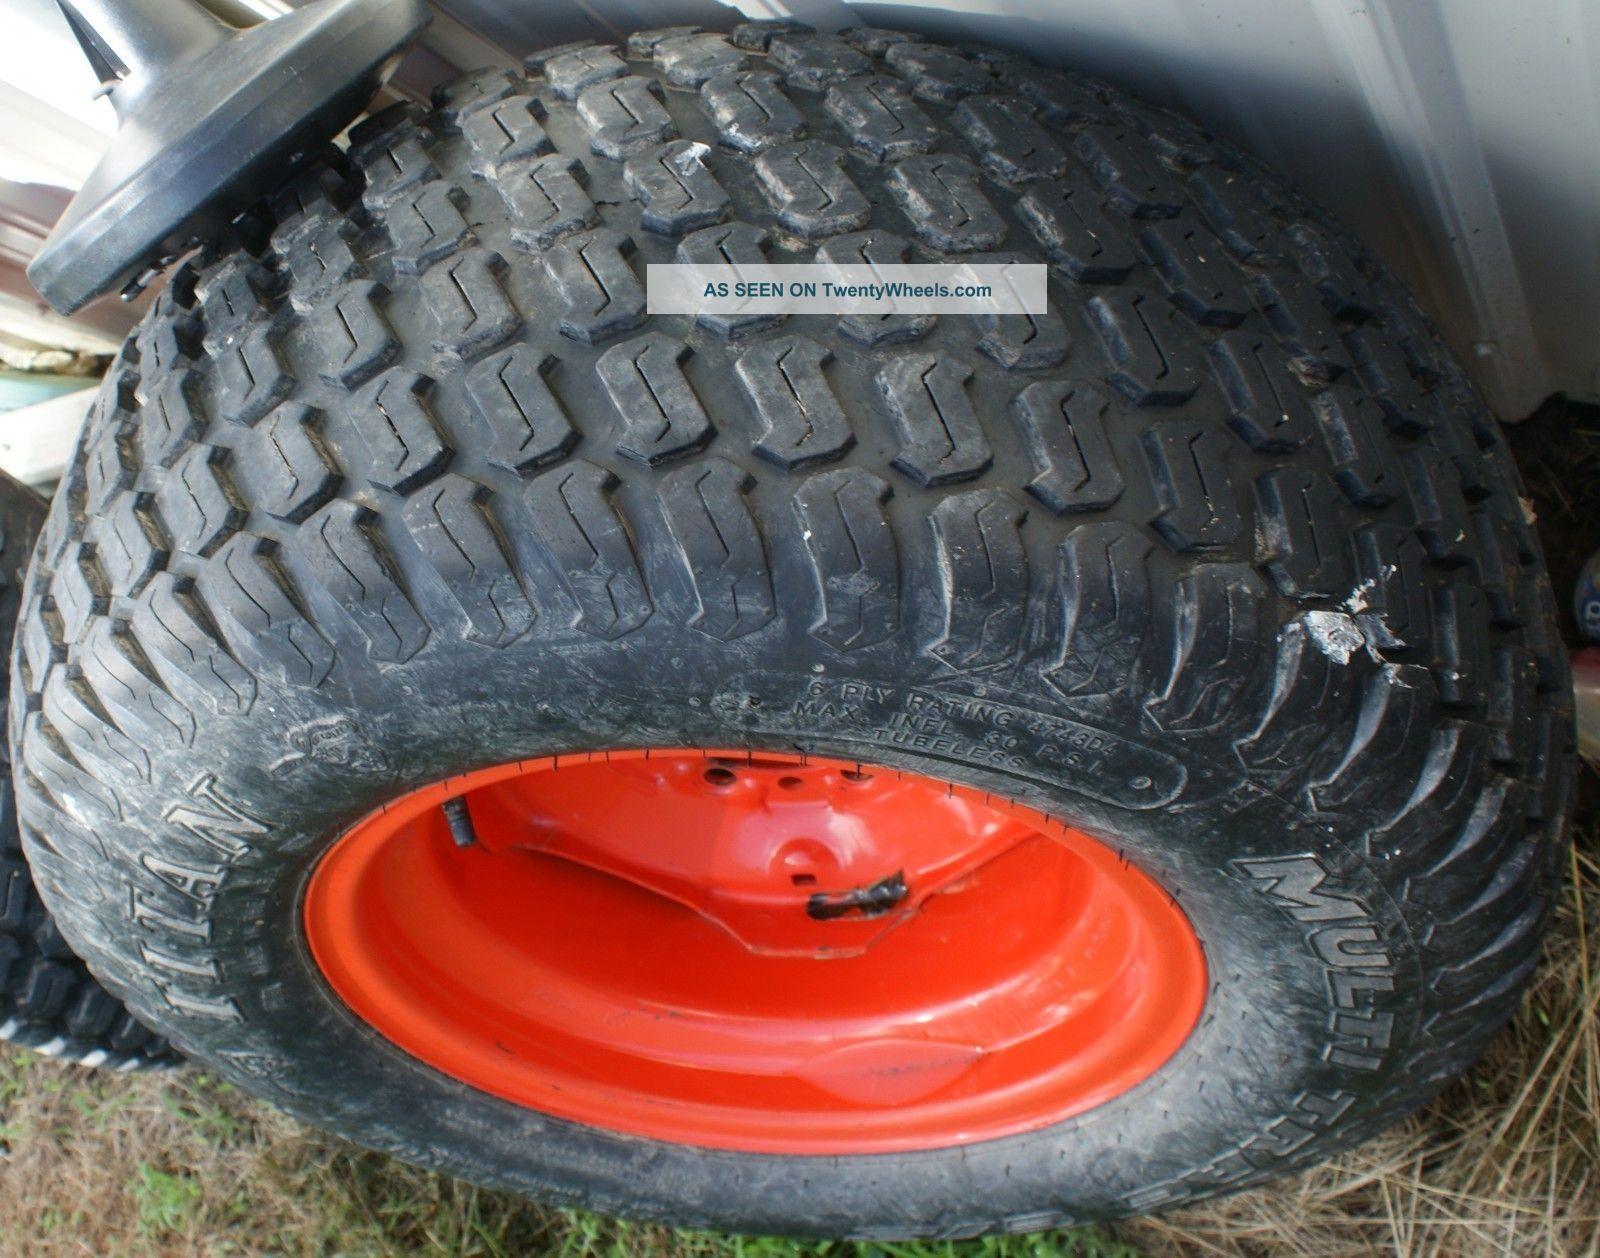 Kubota Tractor Rims Wheels : Tires and rims kubota